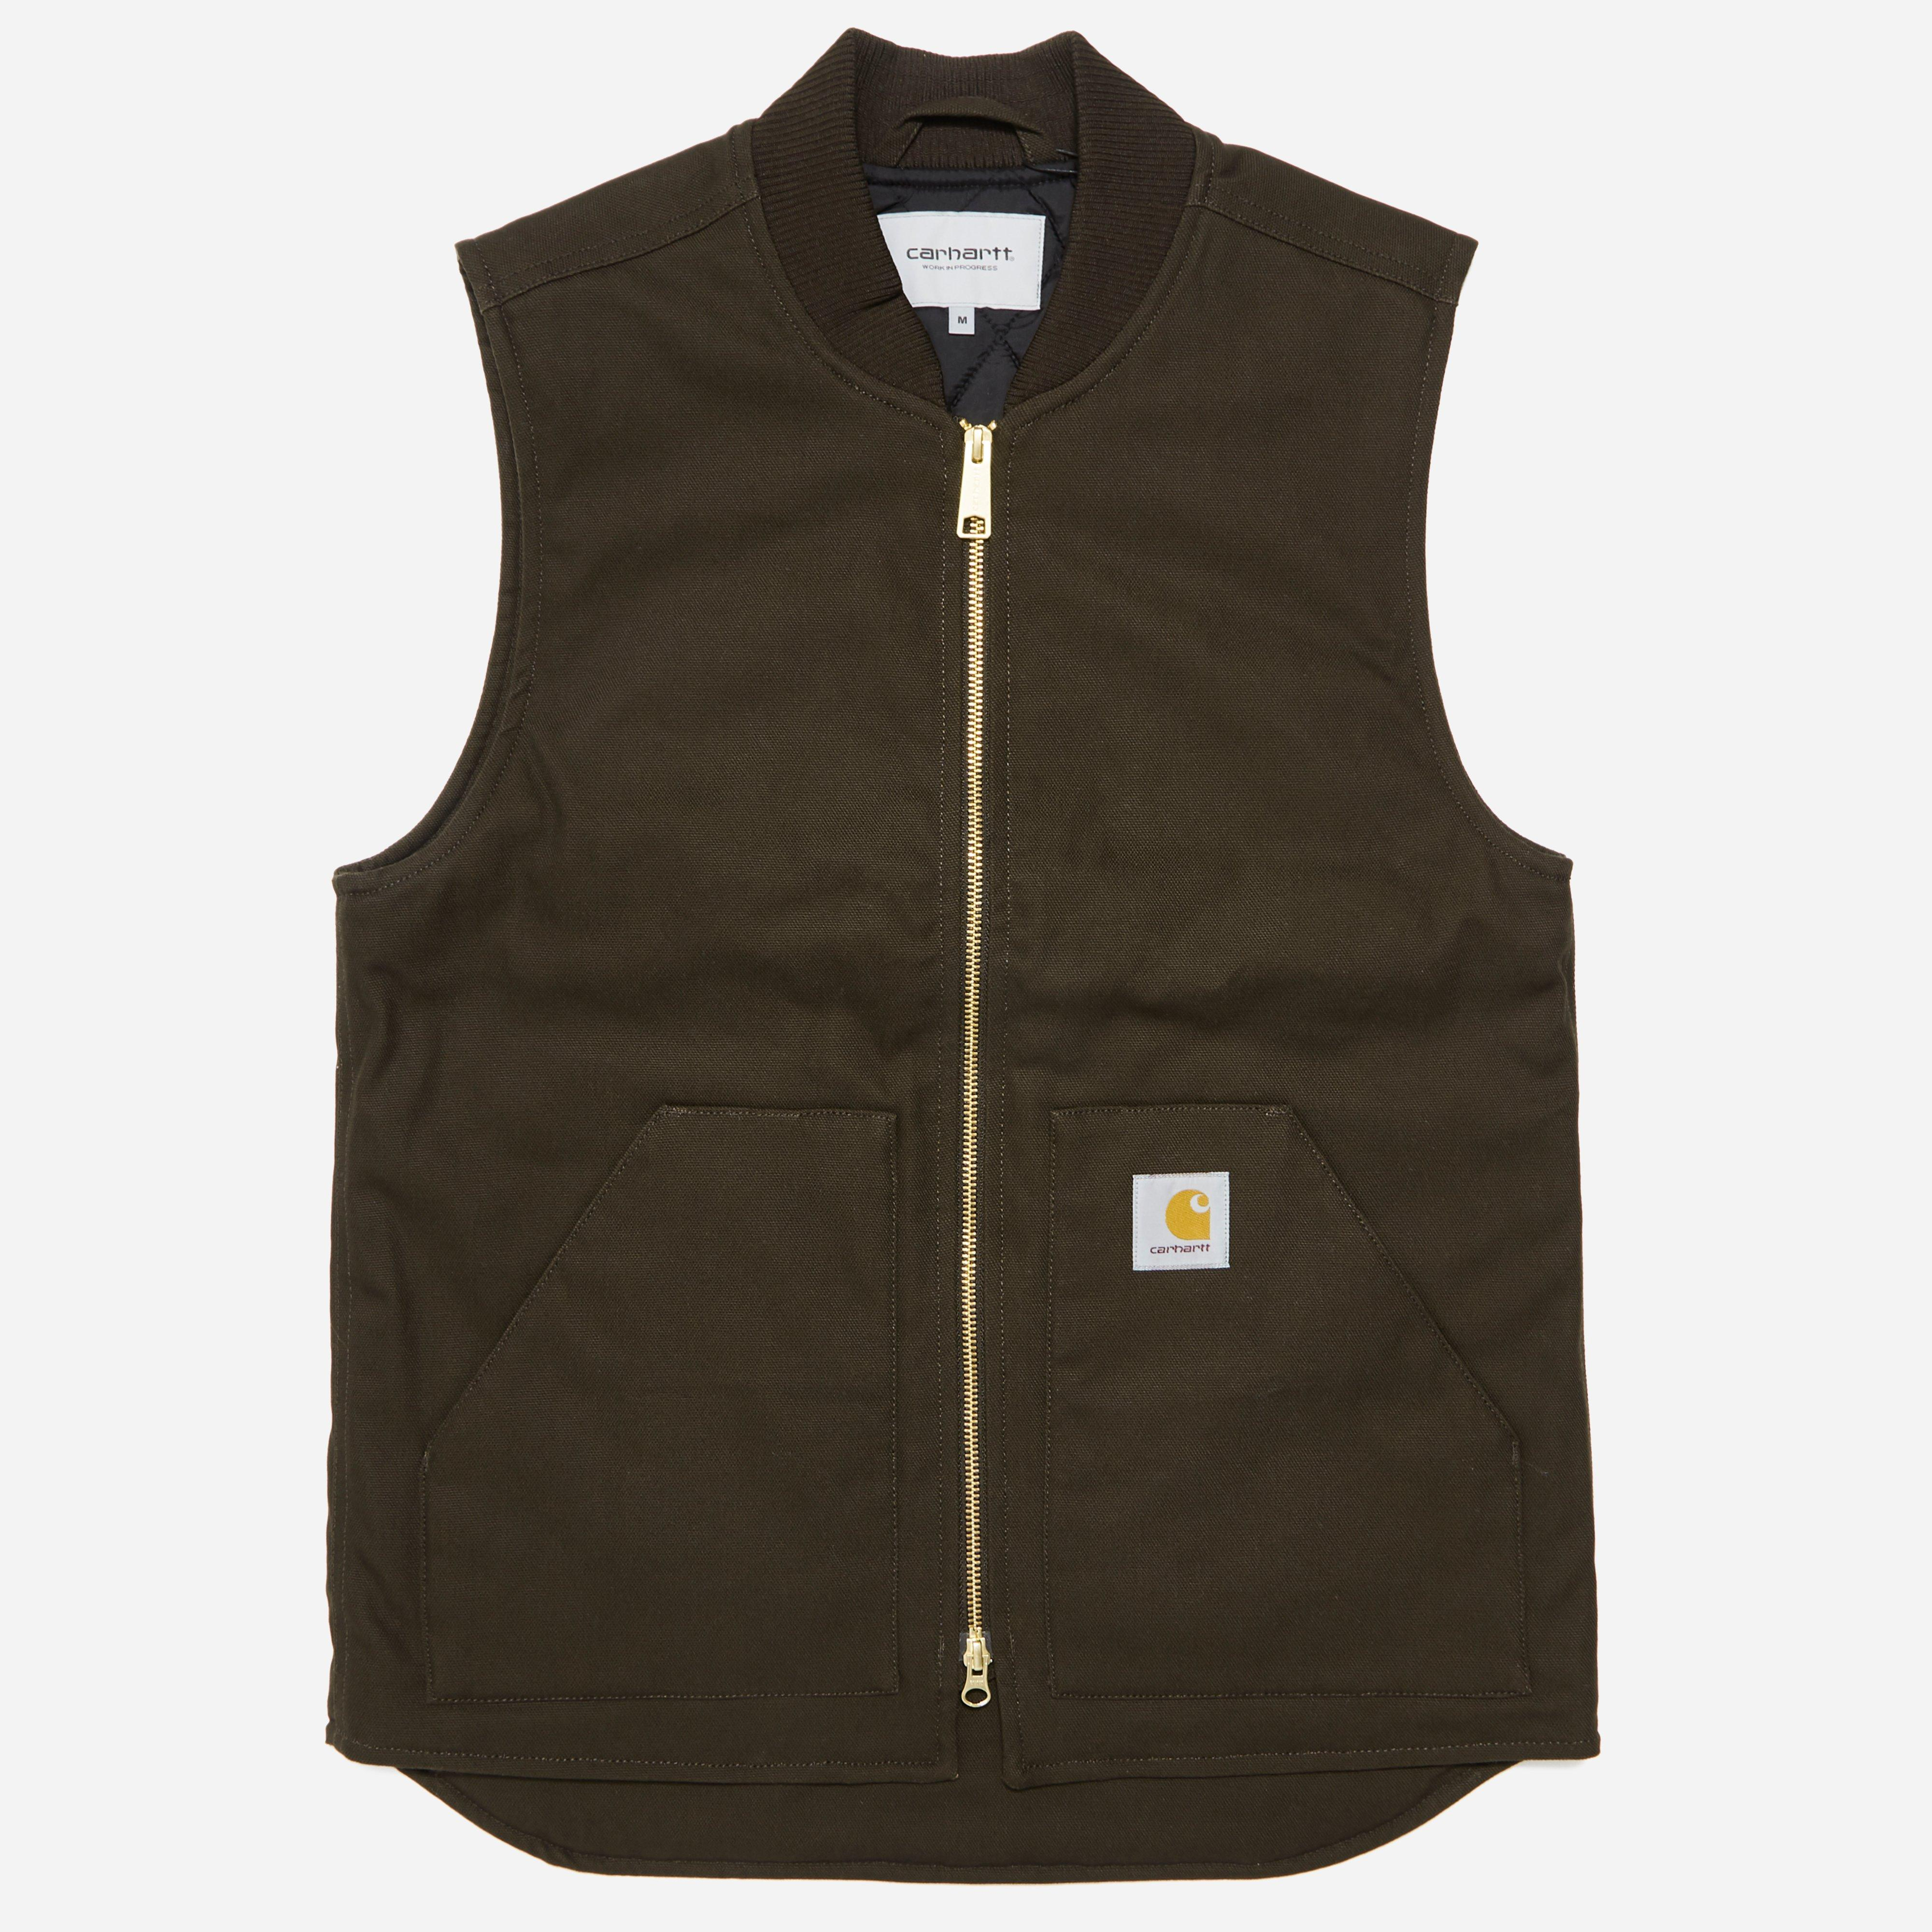 Carhartt Dearborn Vest